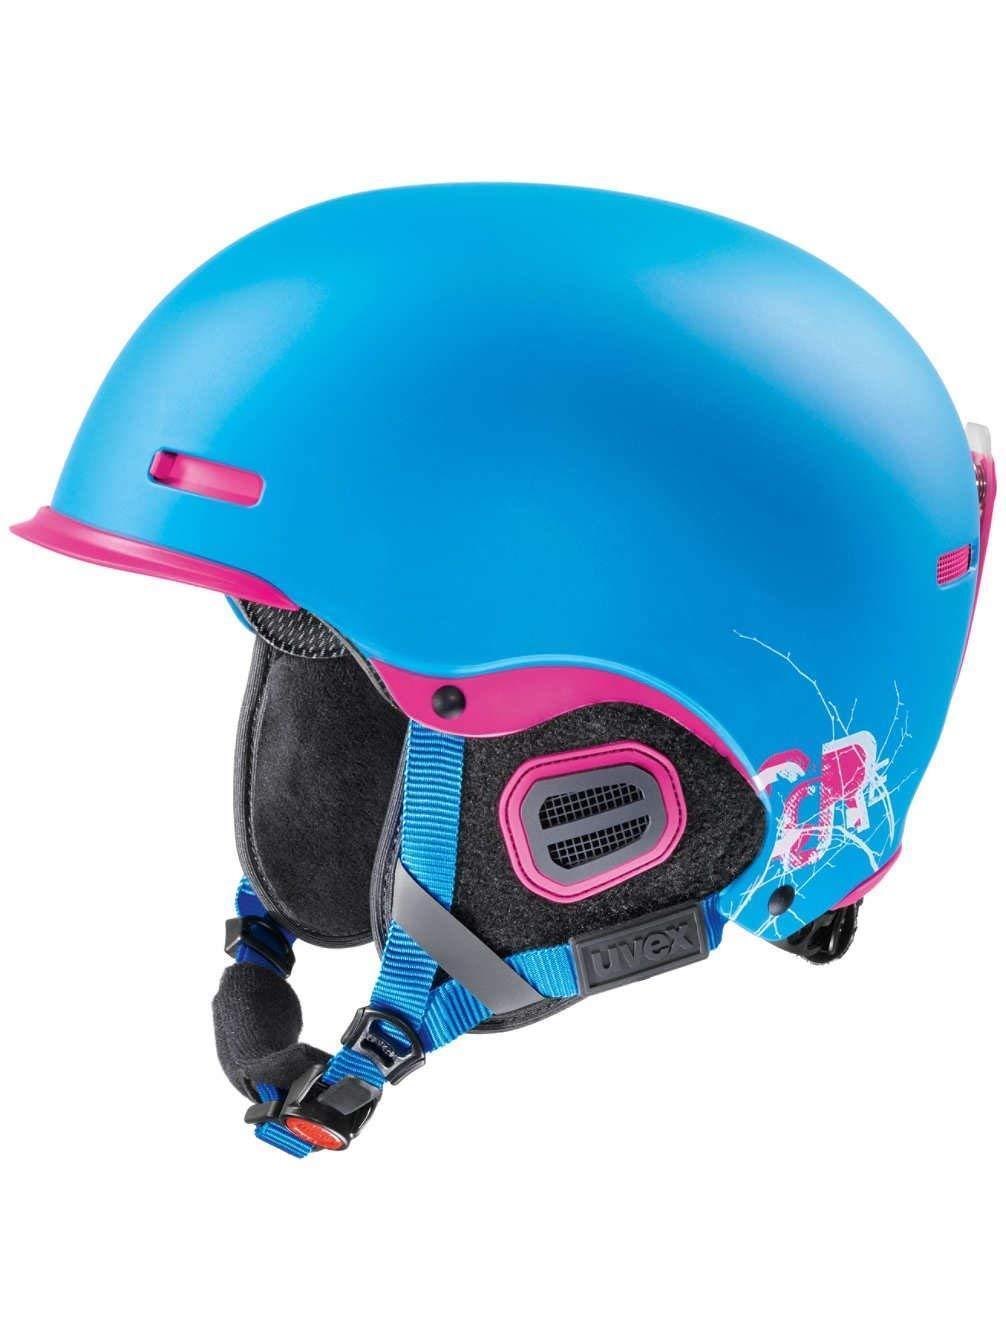 Uvex hlmt 5 pro cyan pink mat Skihelm 52-55cm Snowboardhelm Helm Wintersporthelm